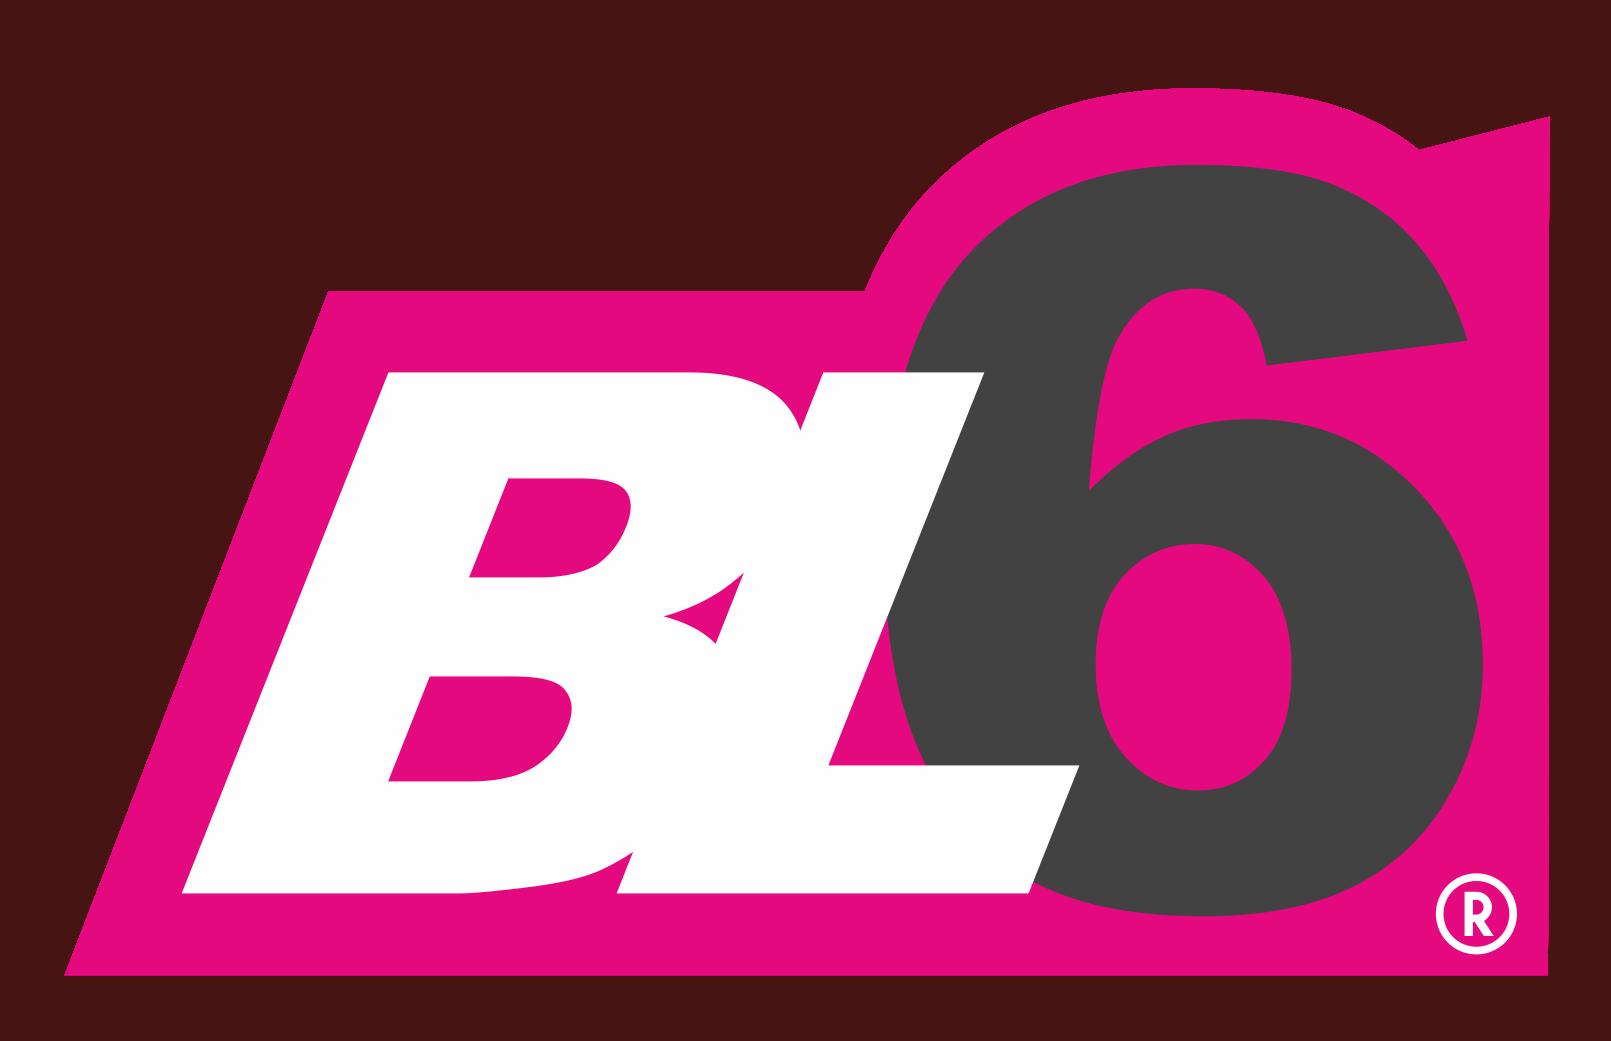 BL6.cz